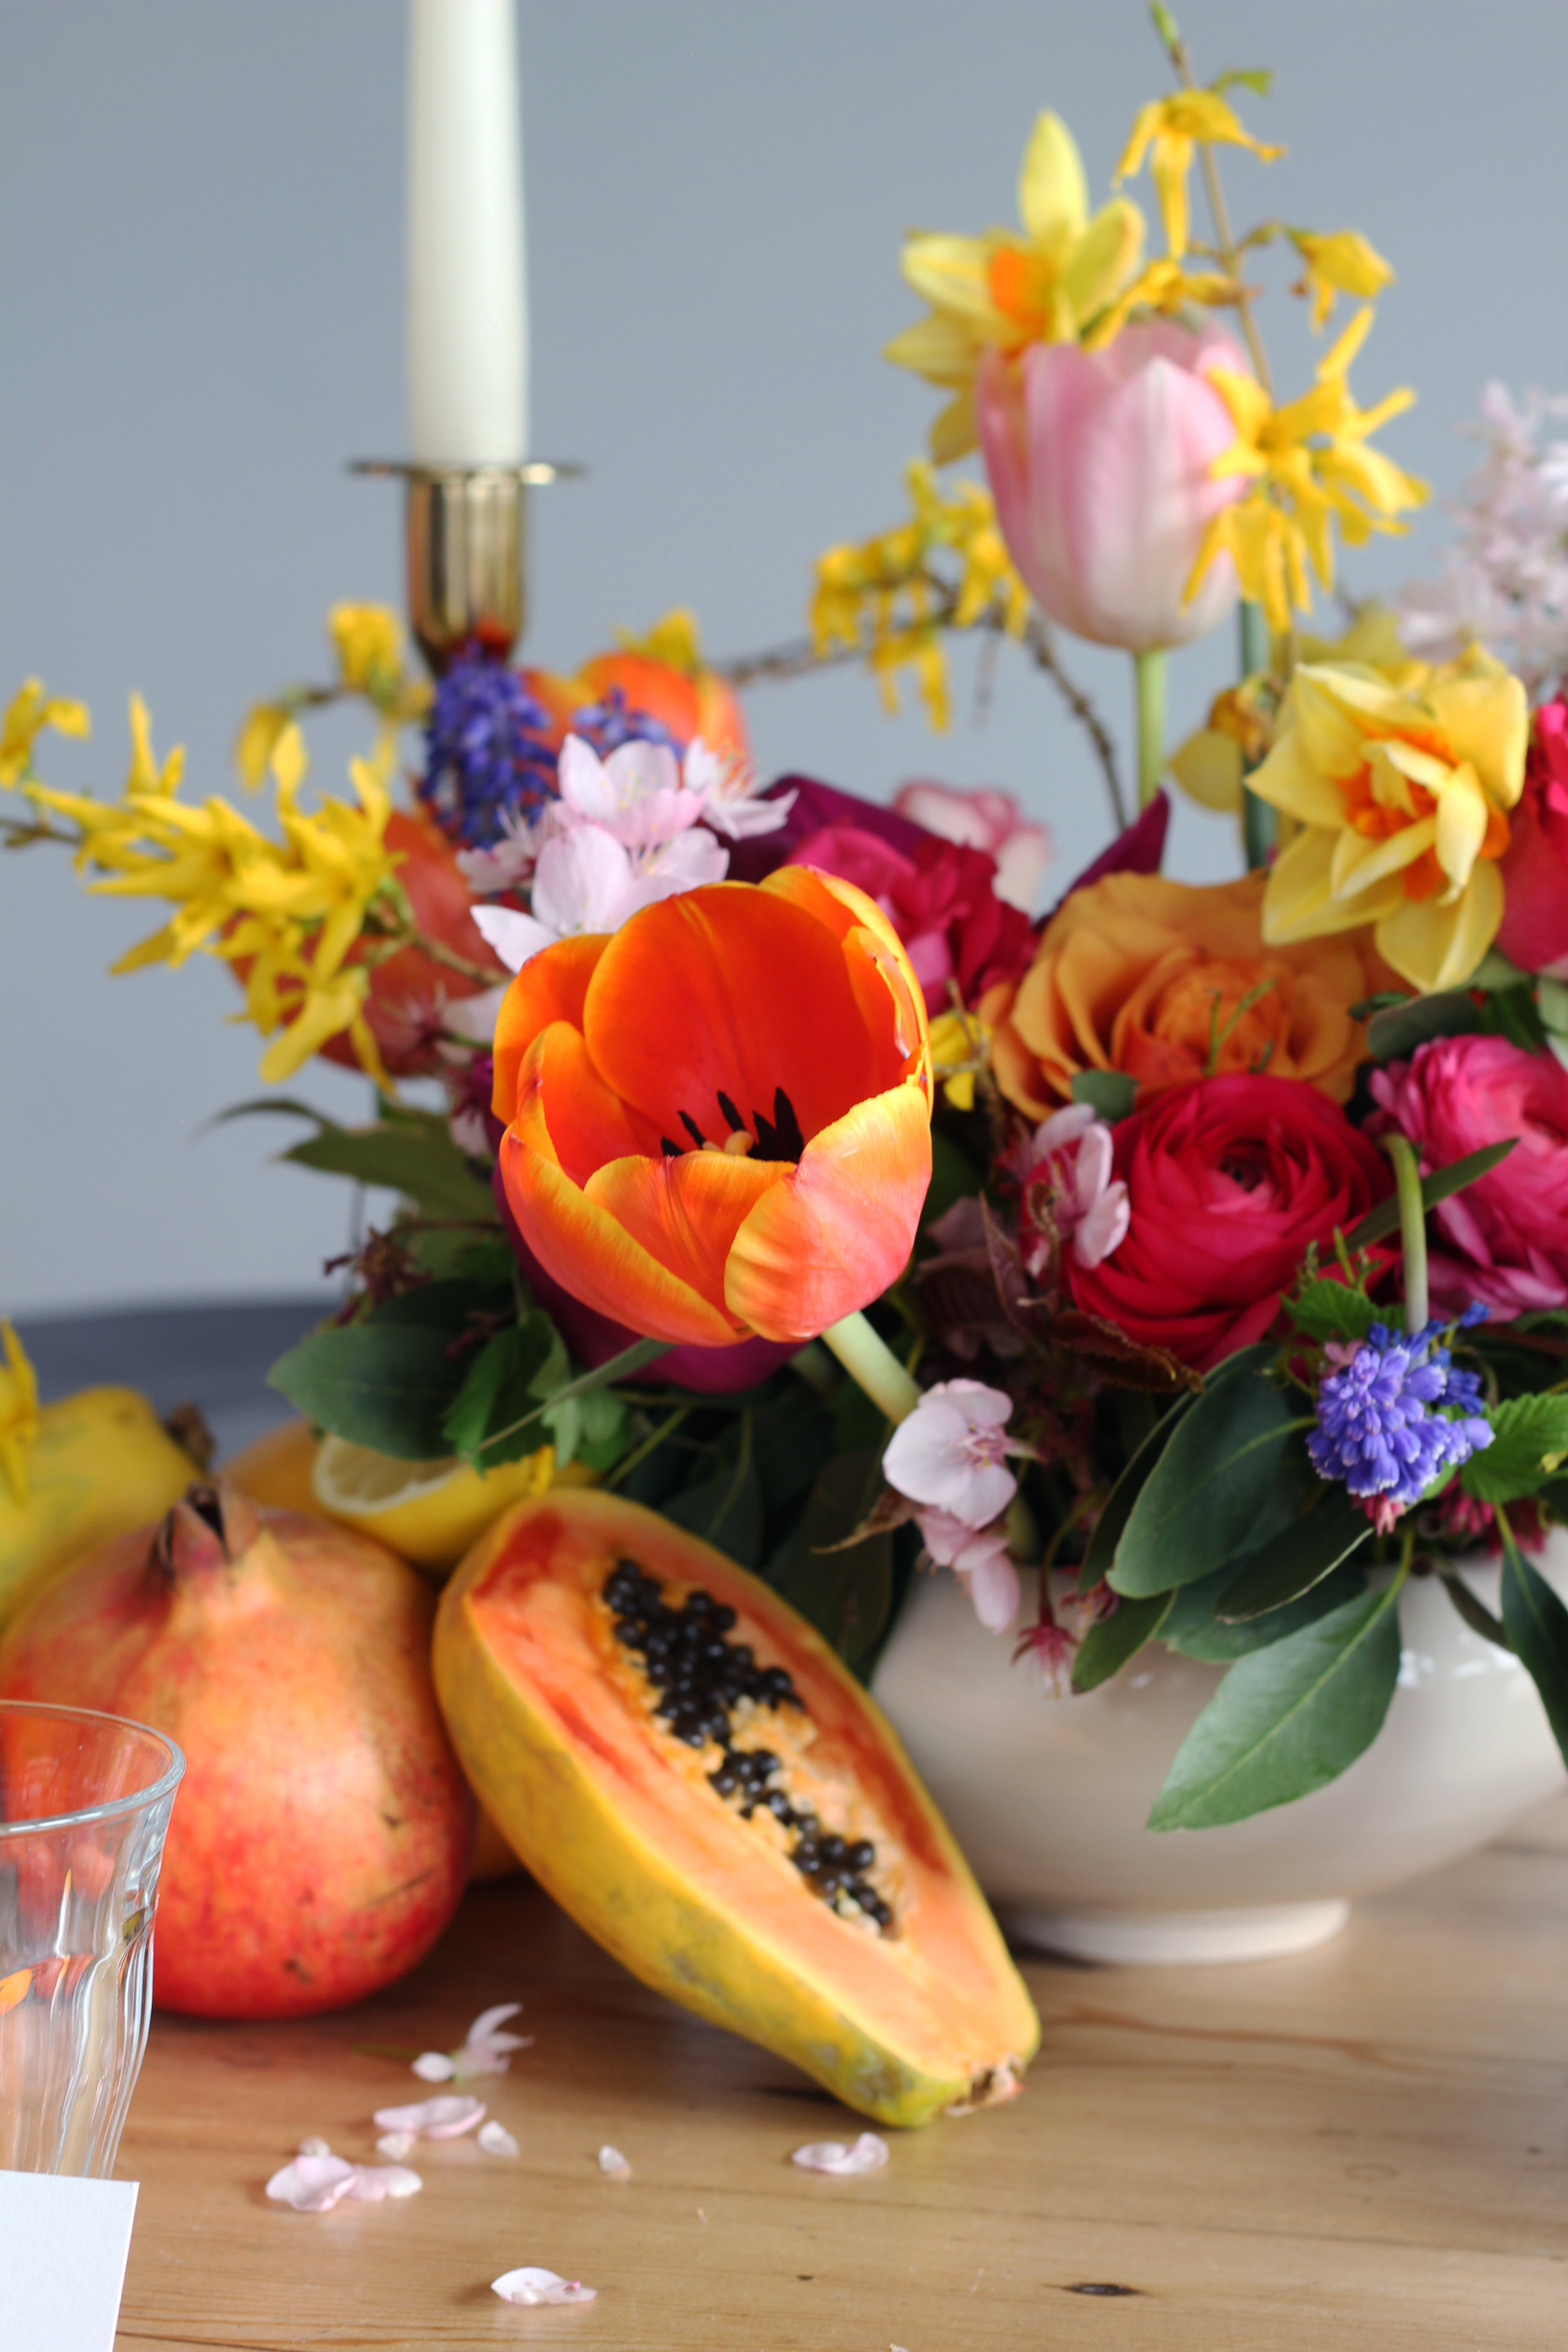 Callie-Pettigrew-Fruity-Florals-17.jpg